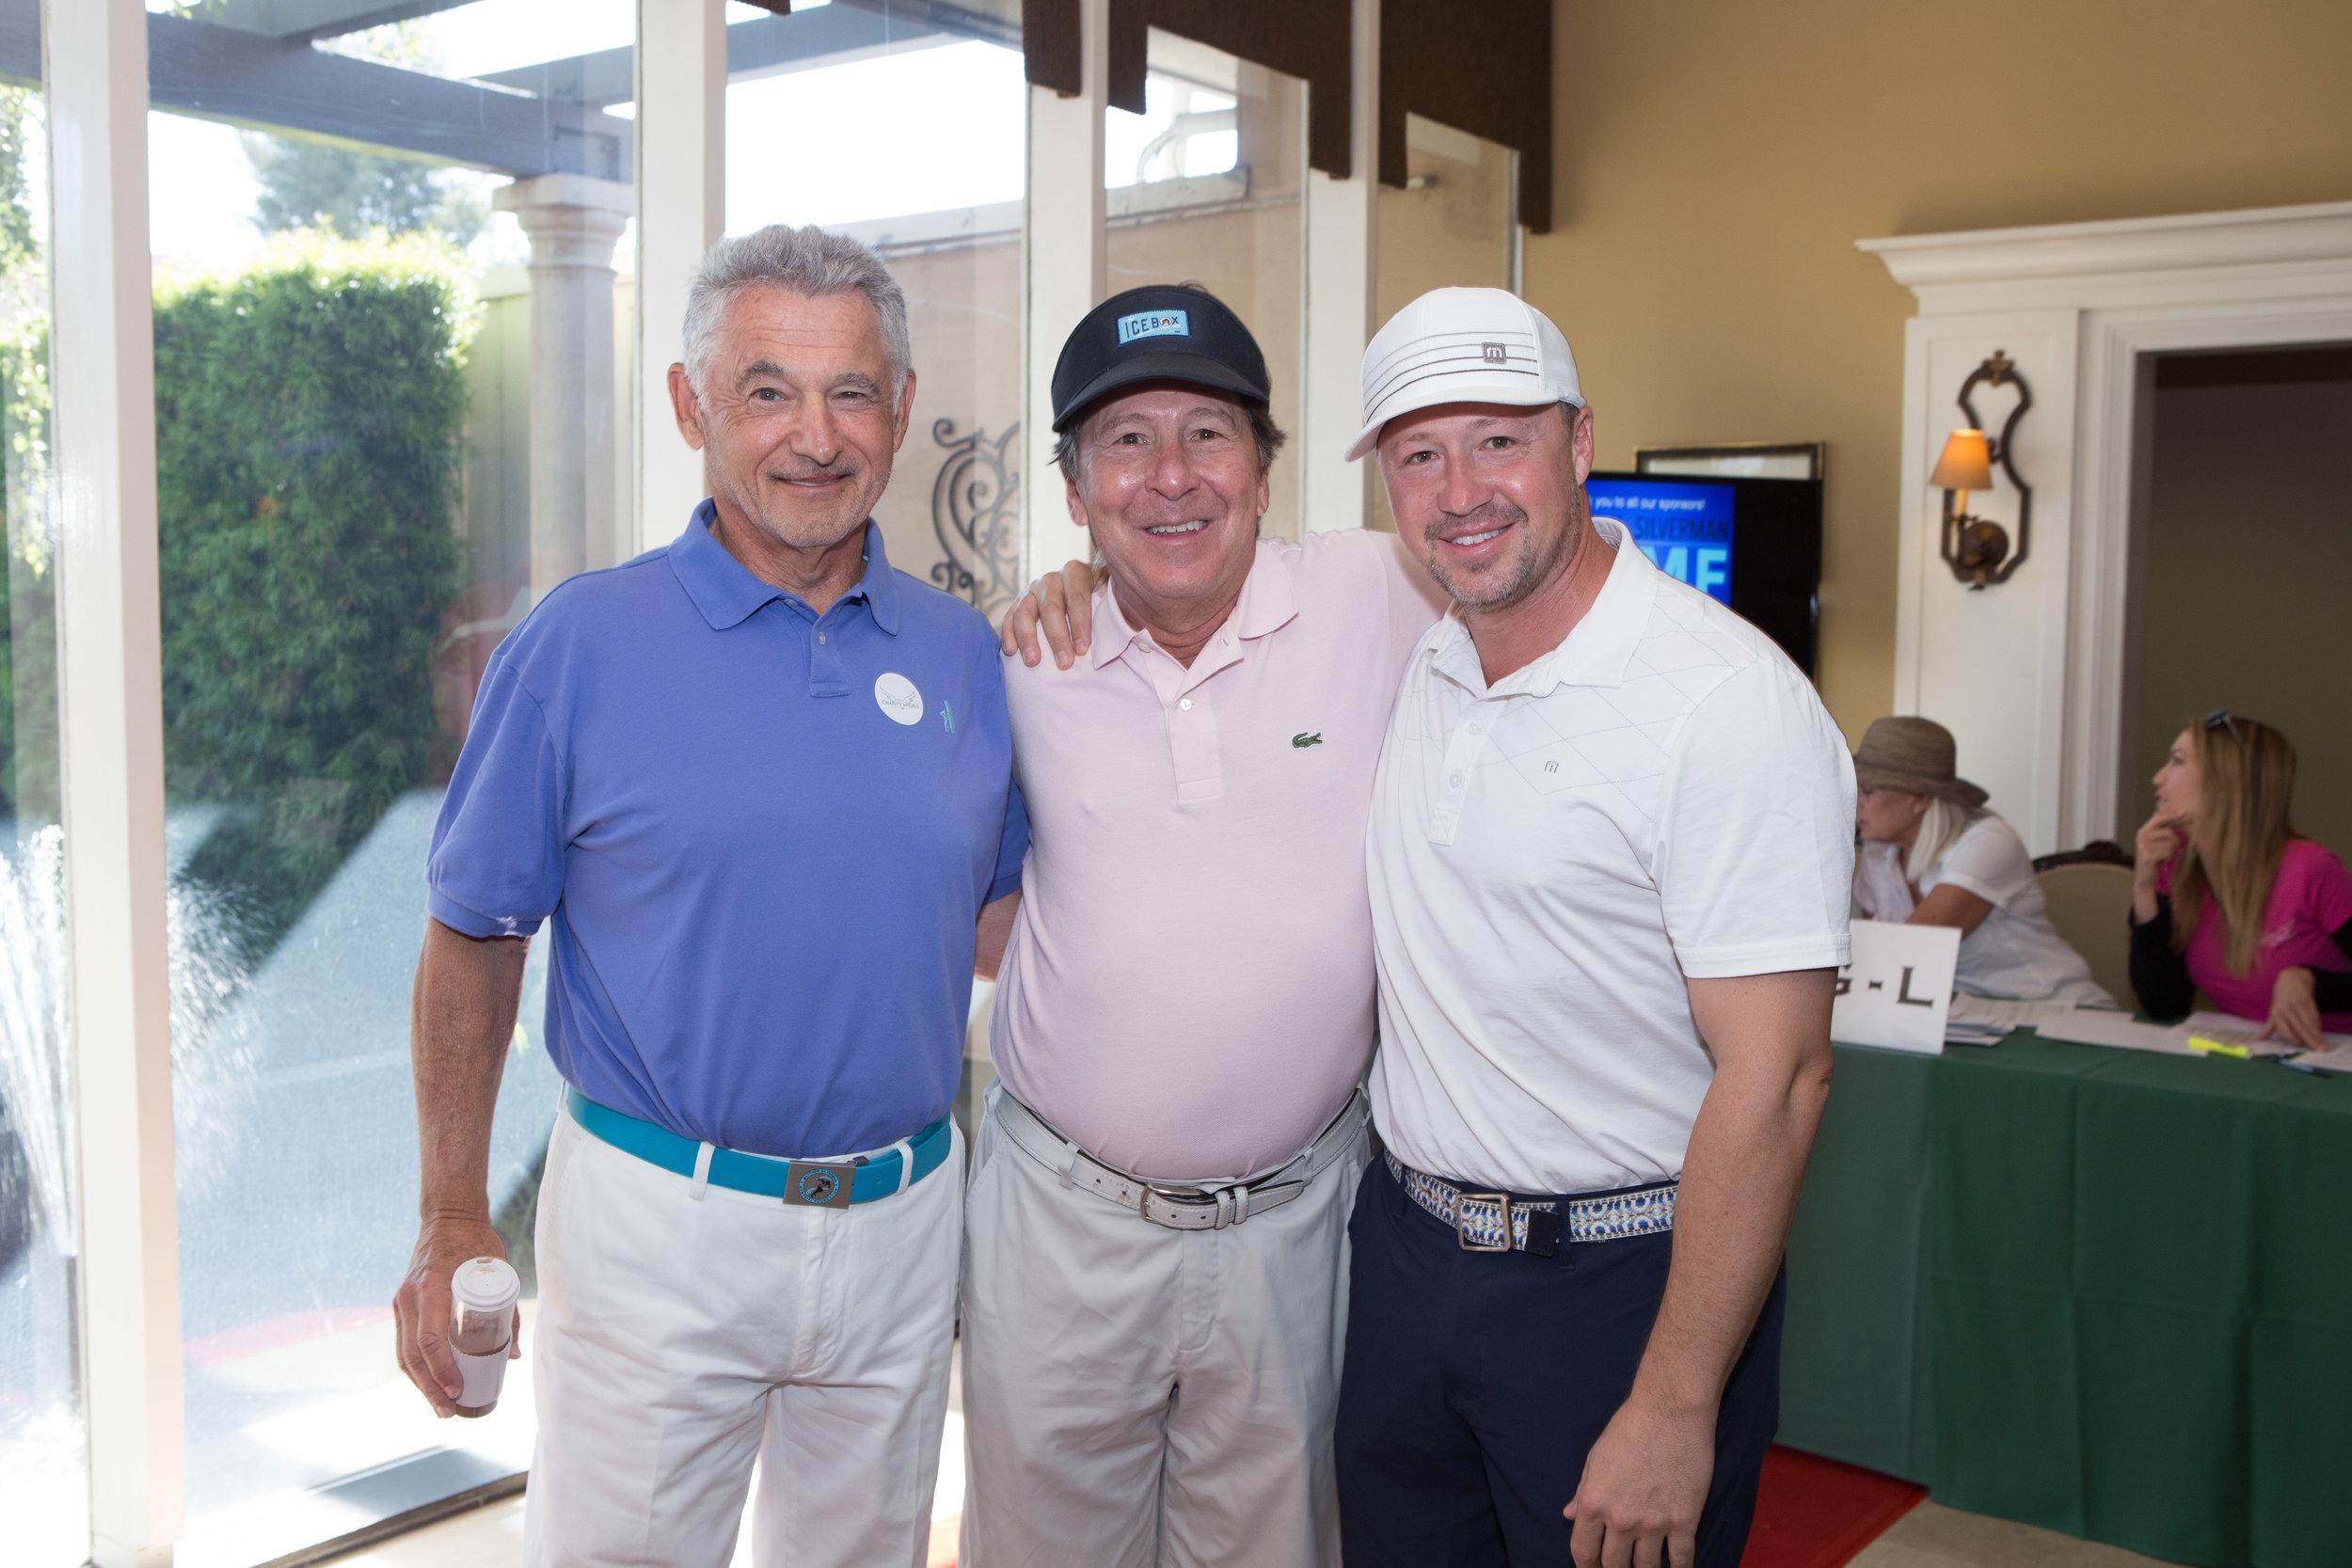 IMG_7660-Ron & Golfers.jpg